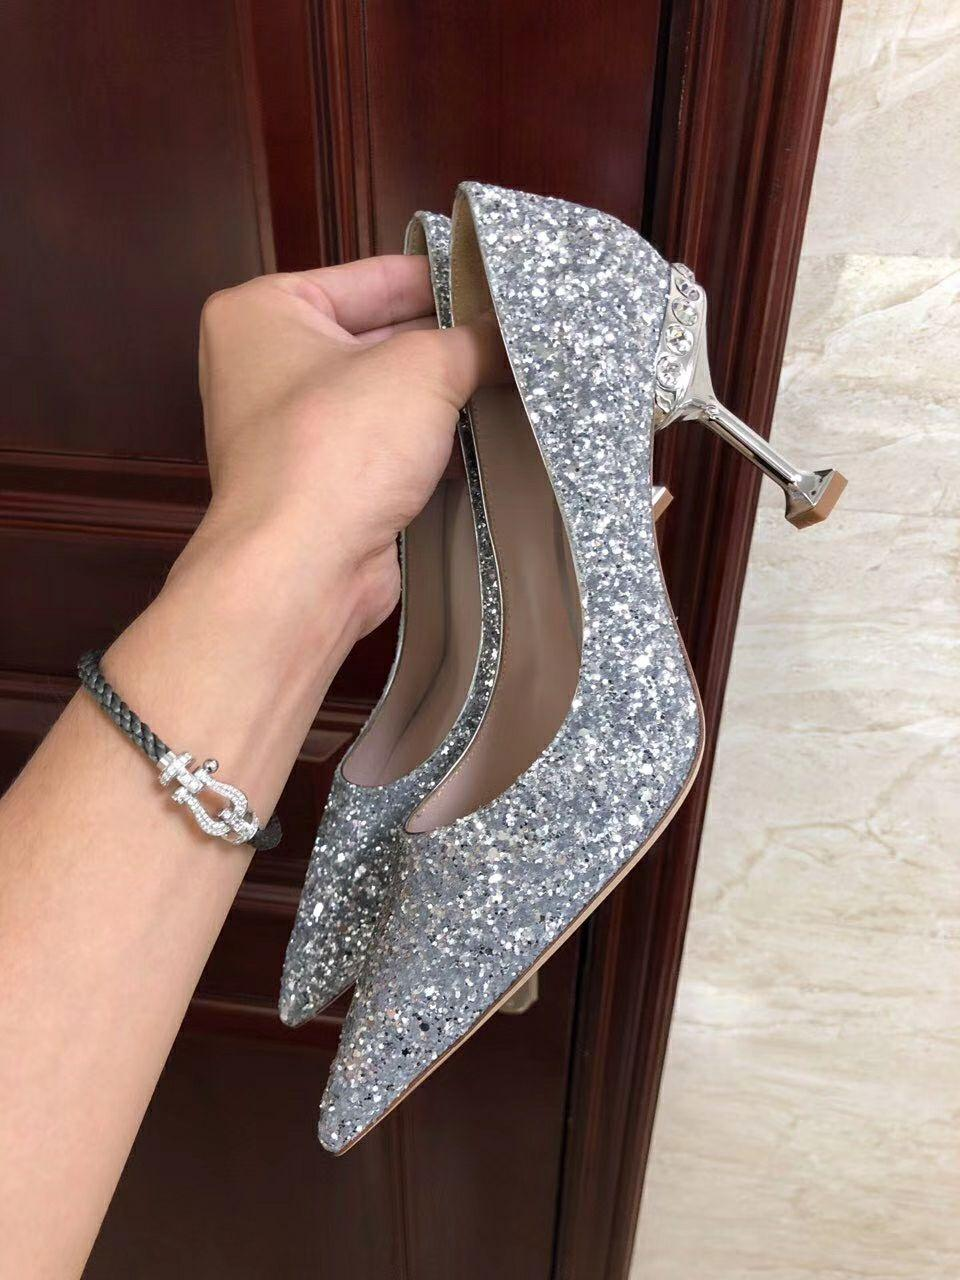 MIU MIU GLITTER FABRIC PUMPS 85 mm heel with crystals SI  ER  8